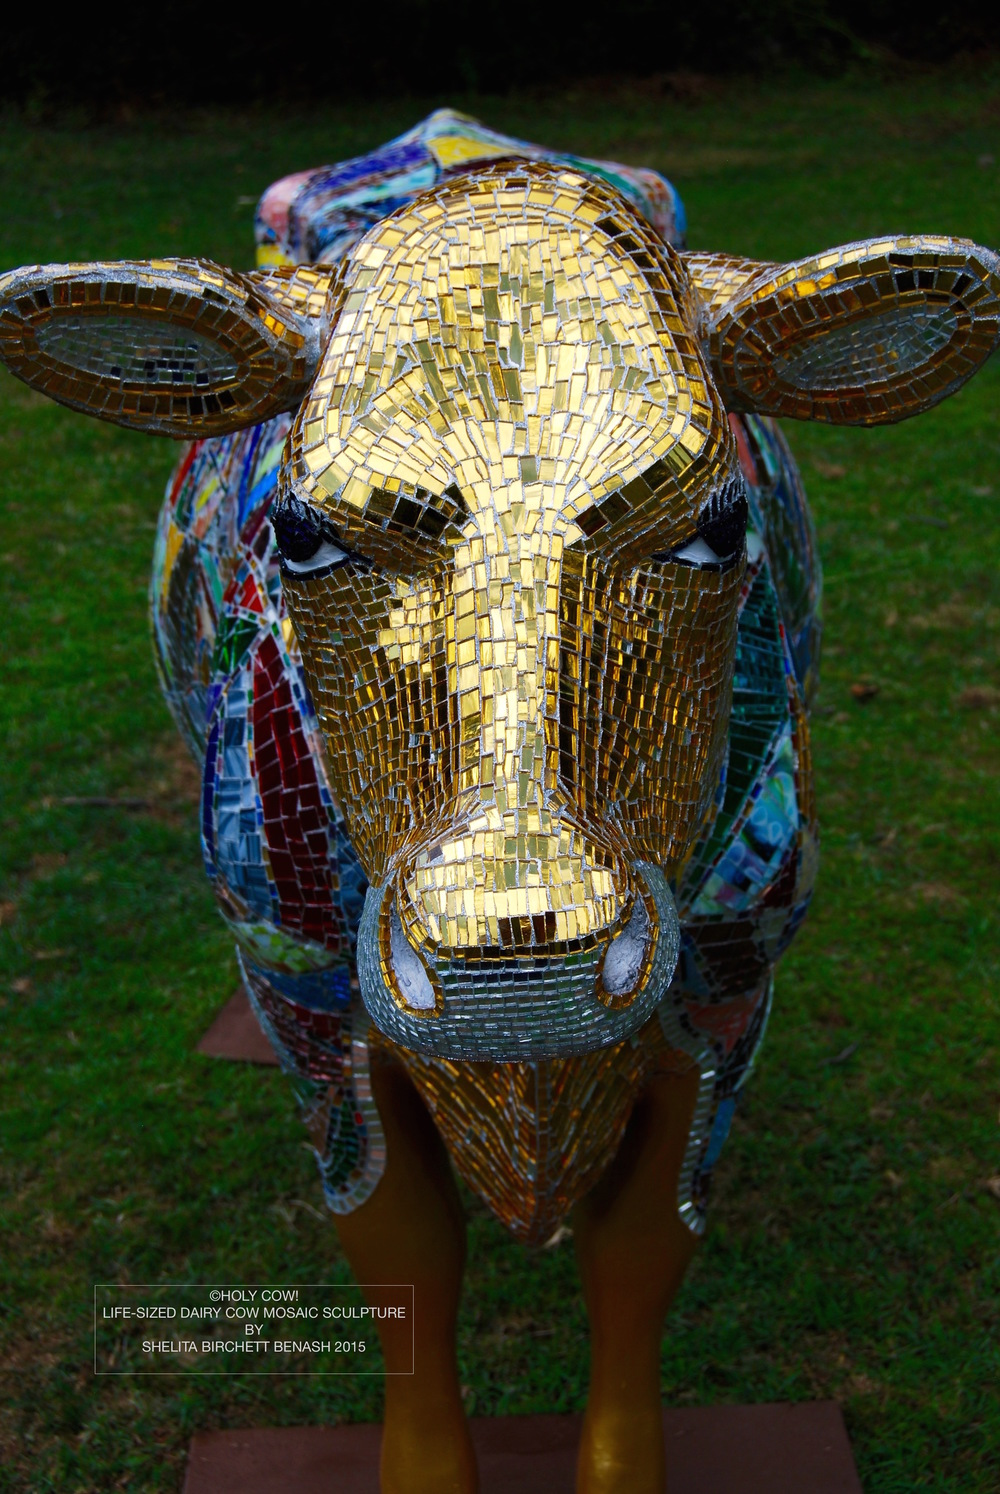 HOLY COW_SHELITA BIRCHETT BENASH_2015_FRONT_DETAIL